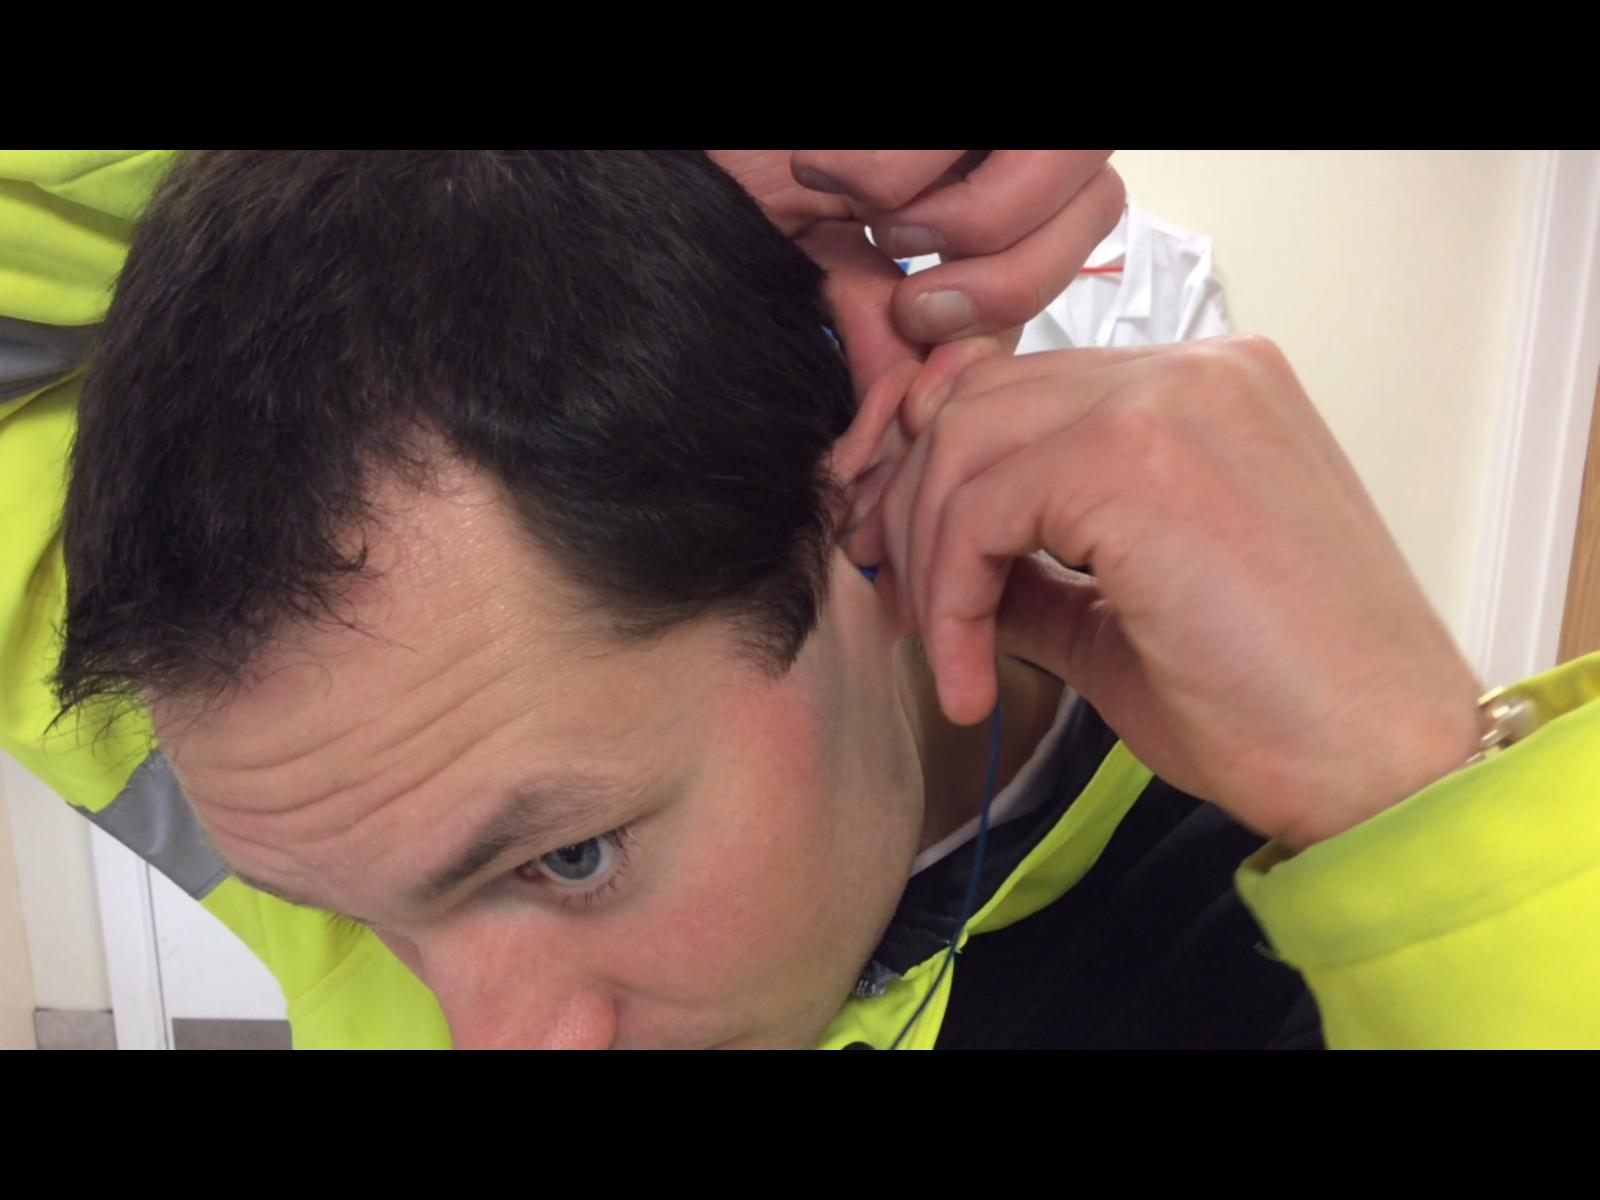 Man inserting earplug into ear canal